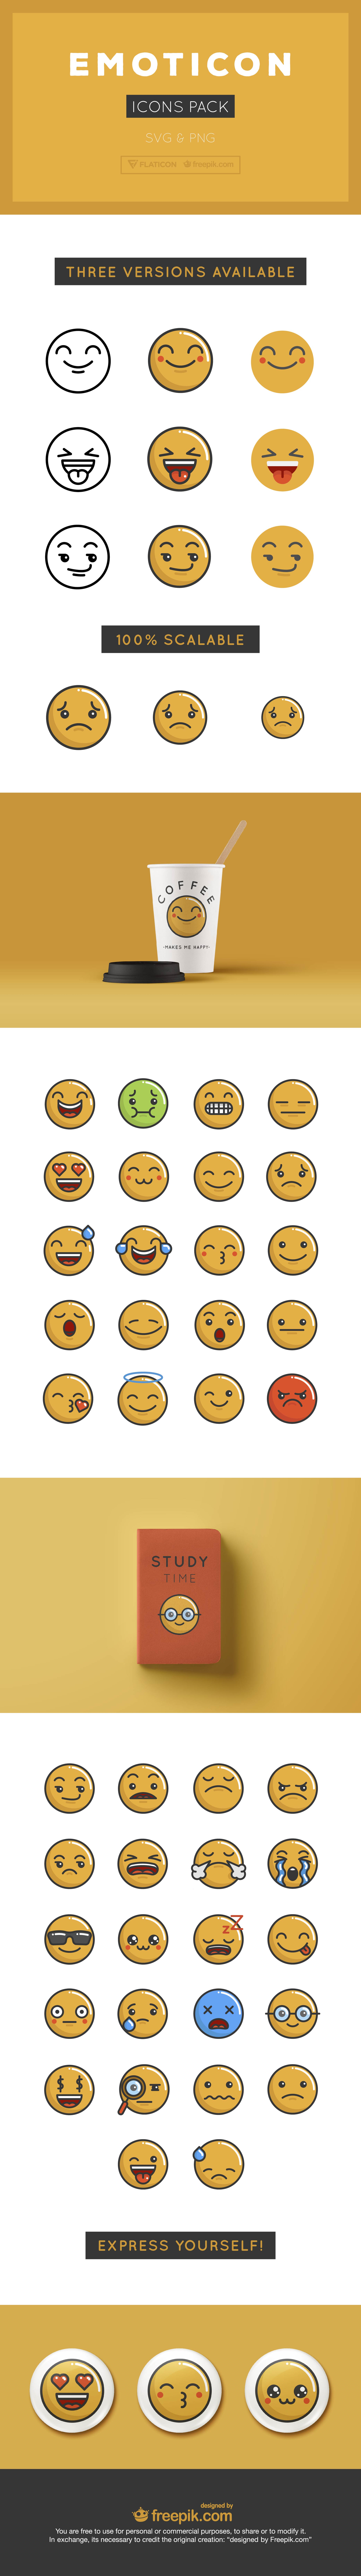 free emoticon icons